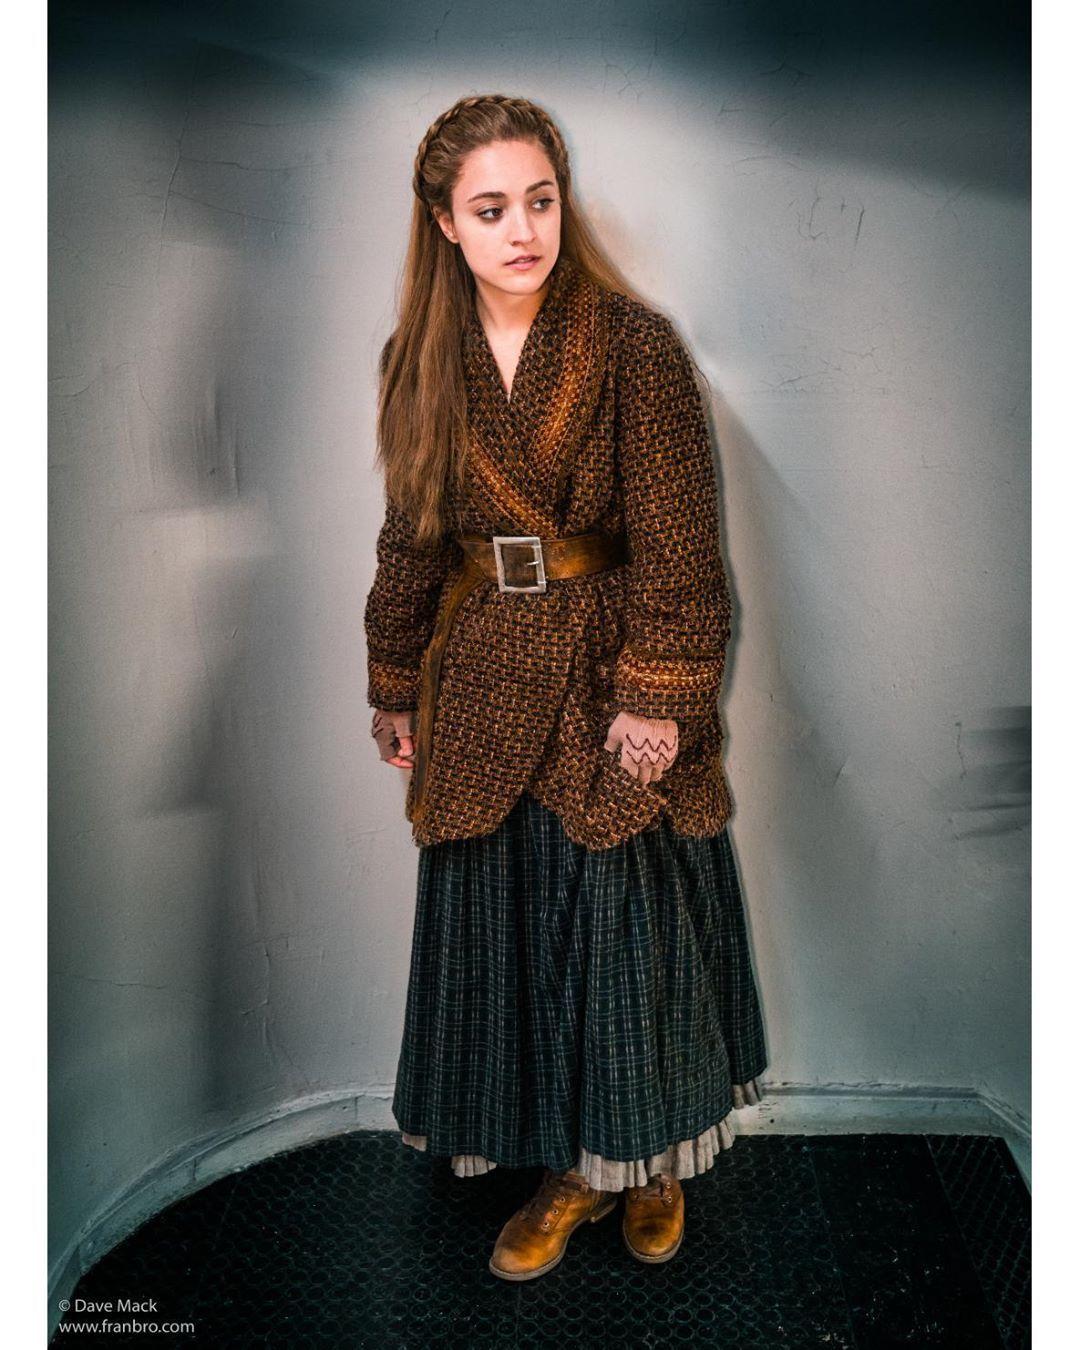 Anastasia Mayo Peliculas pin de gore arr en musicals world en 2019   anastasia